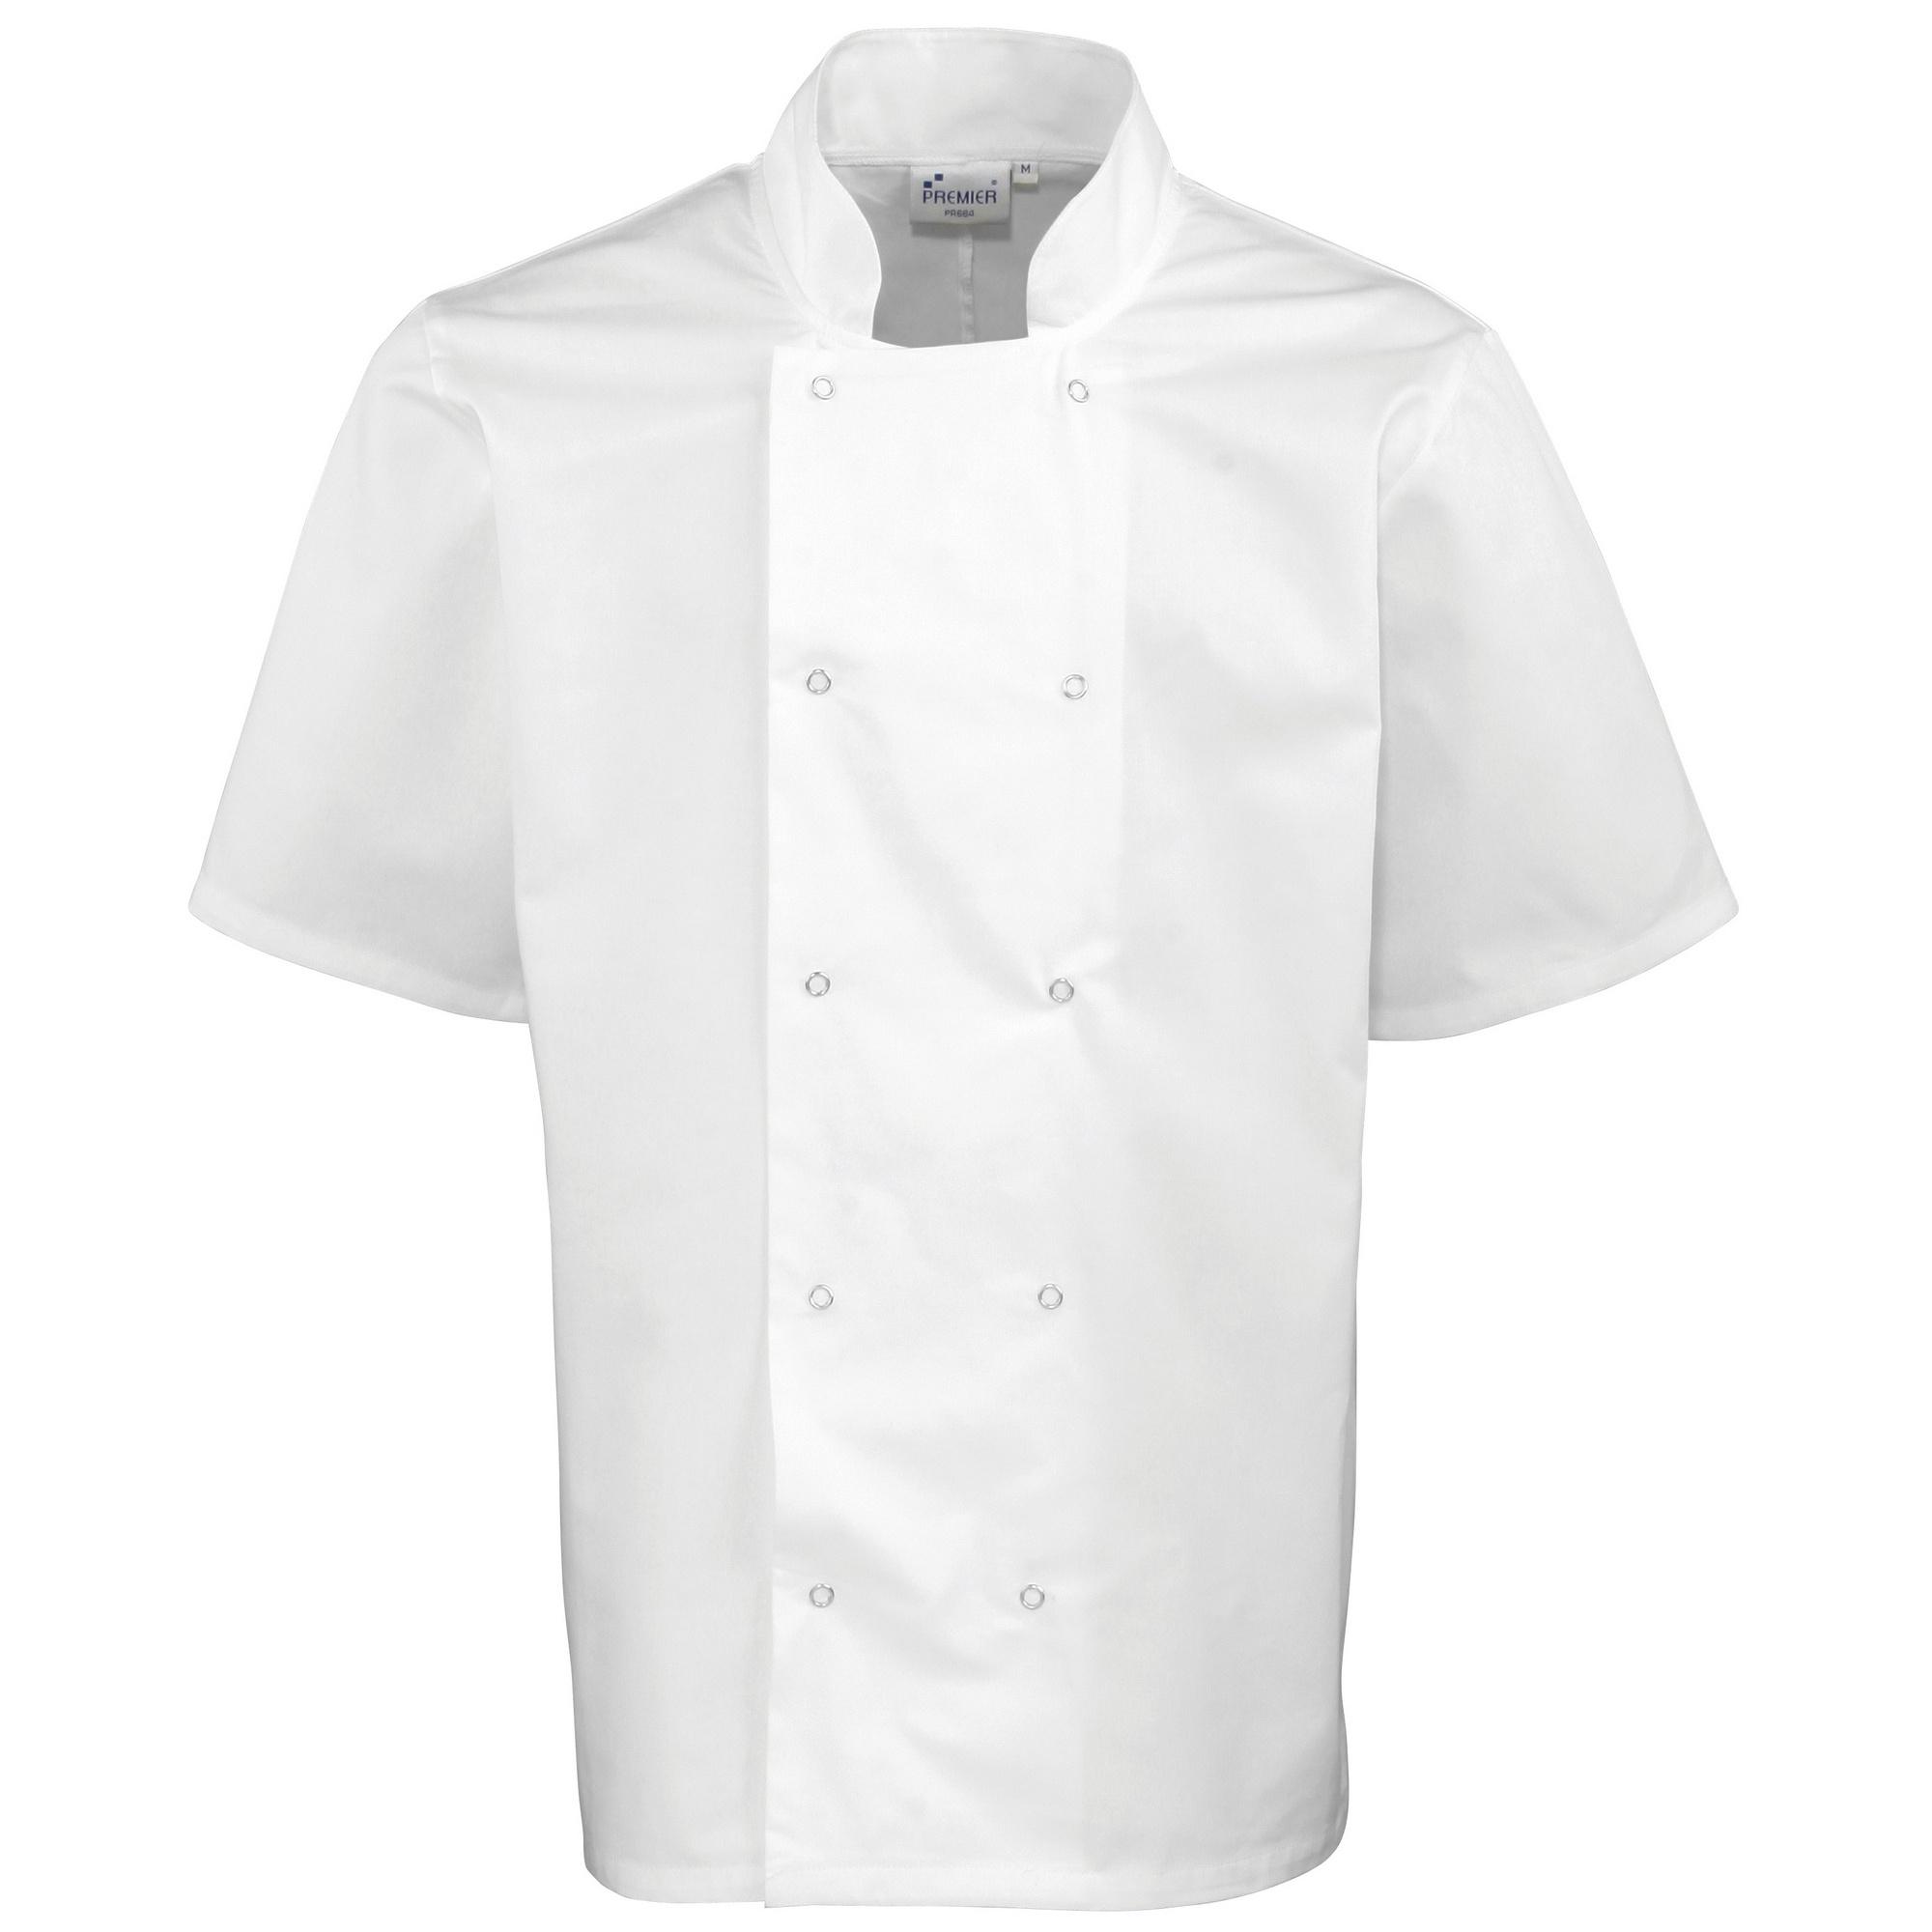 Premier Unisex Studded Front Short Sleeve Chefs Jacket (M) (White)